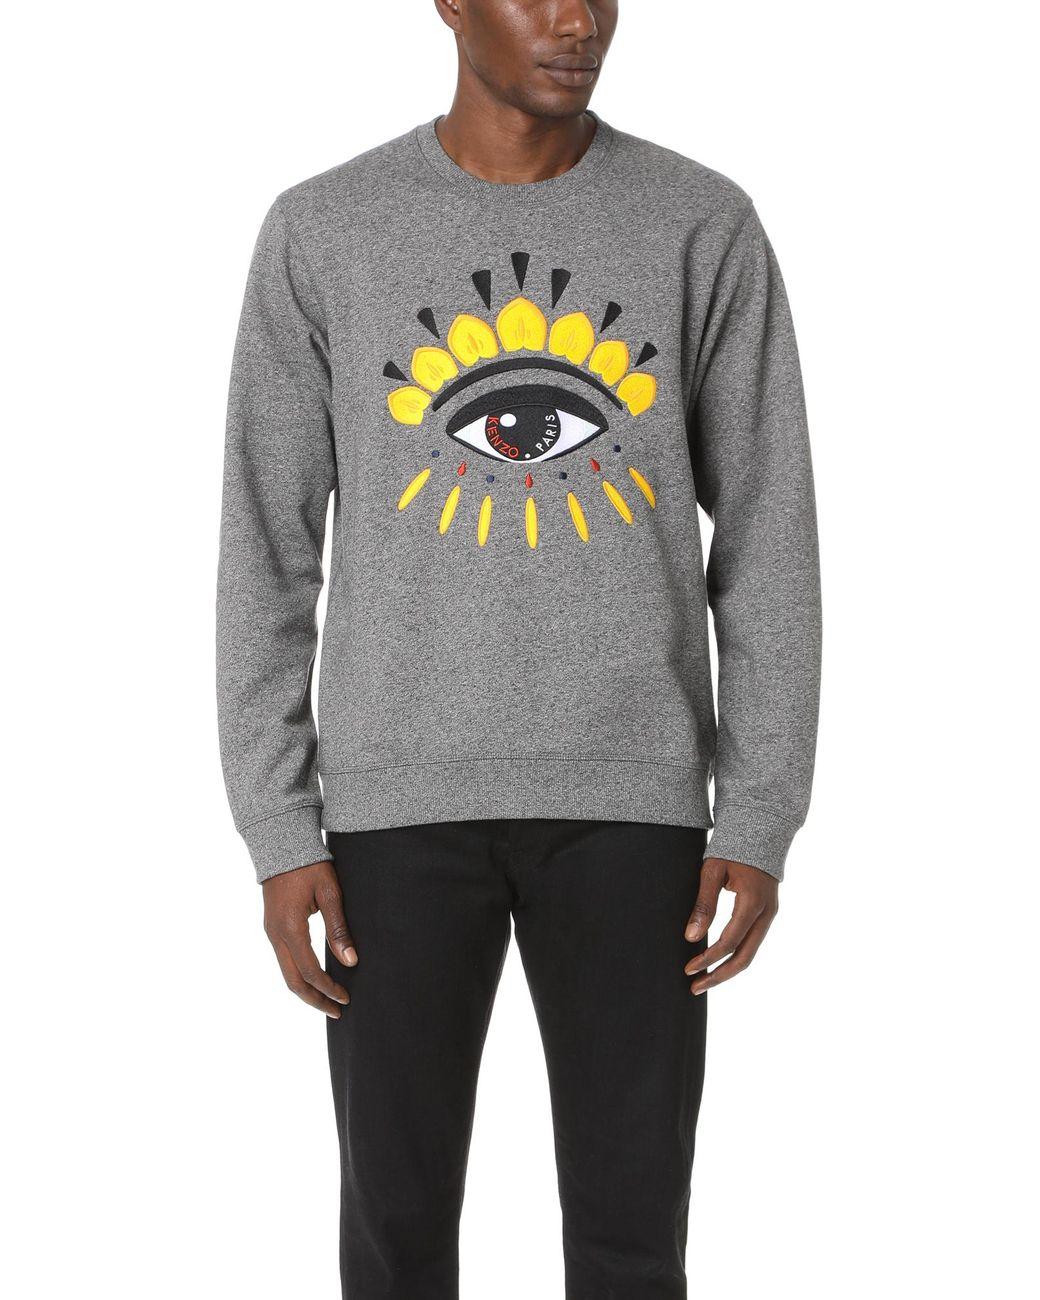 07d6529df KENZO Eye Crew Sweatshirt in Gray for Men - Save 12% - Lyst